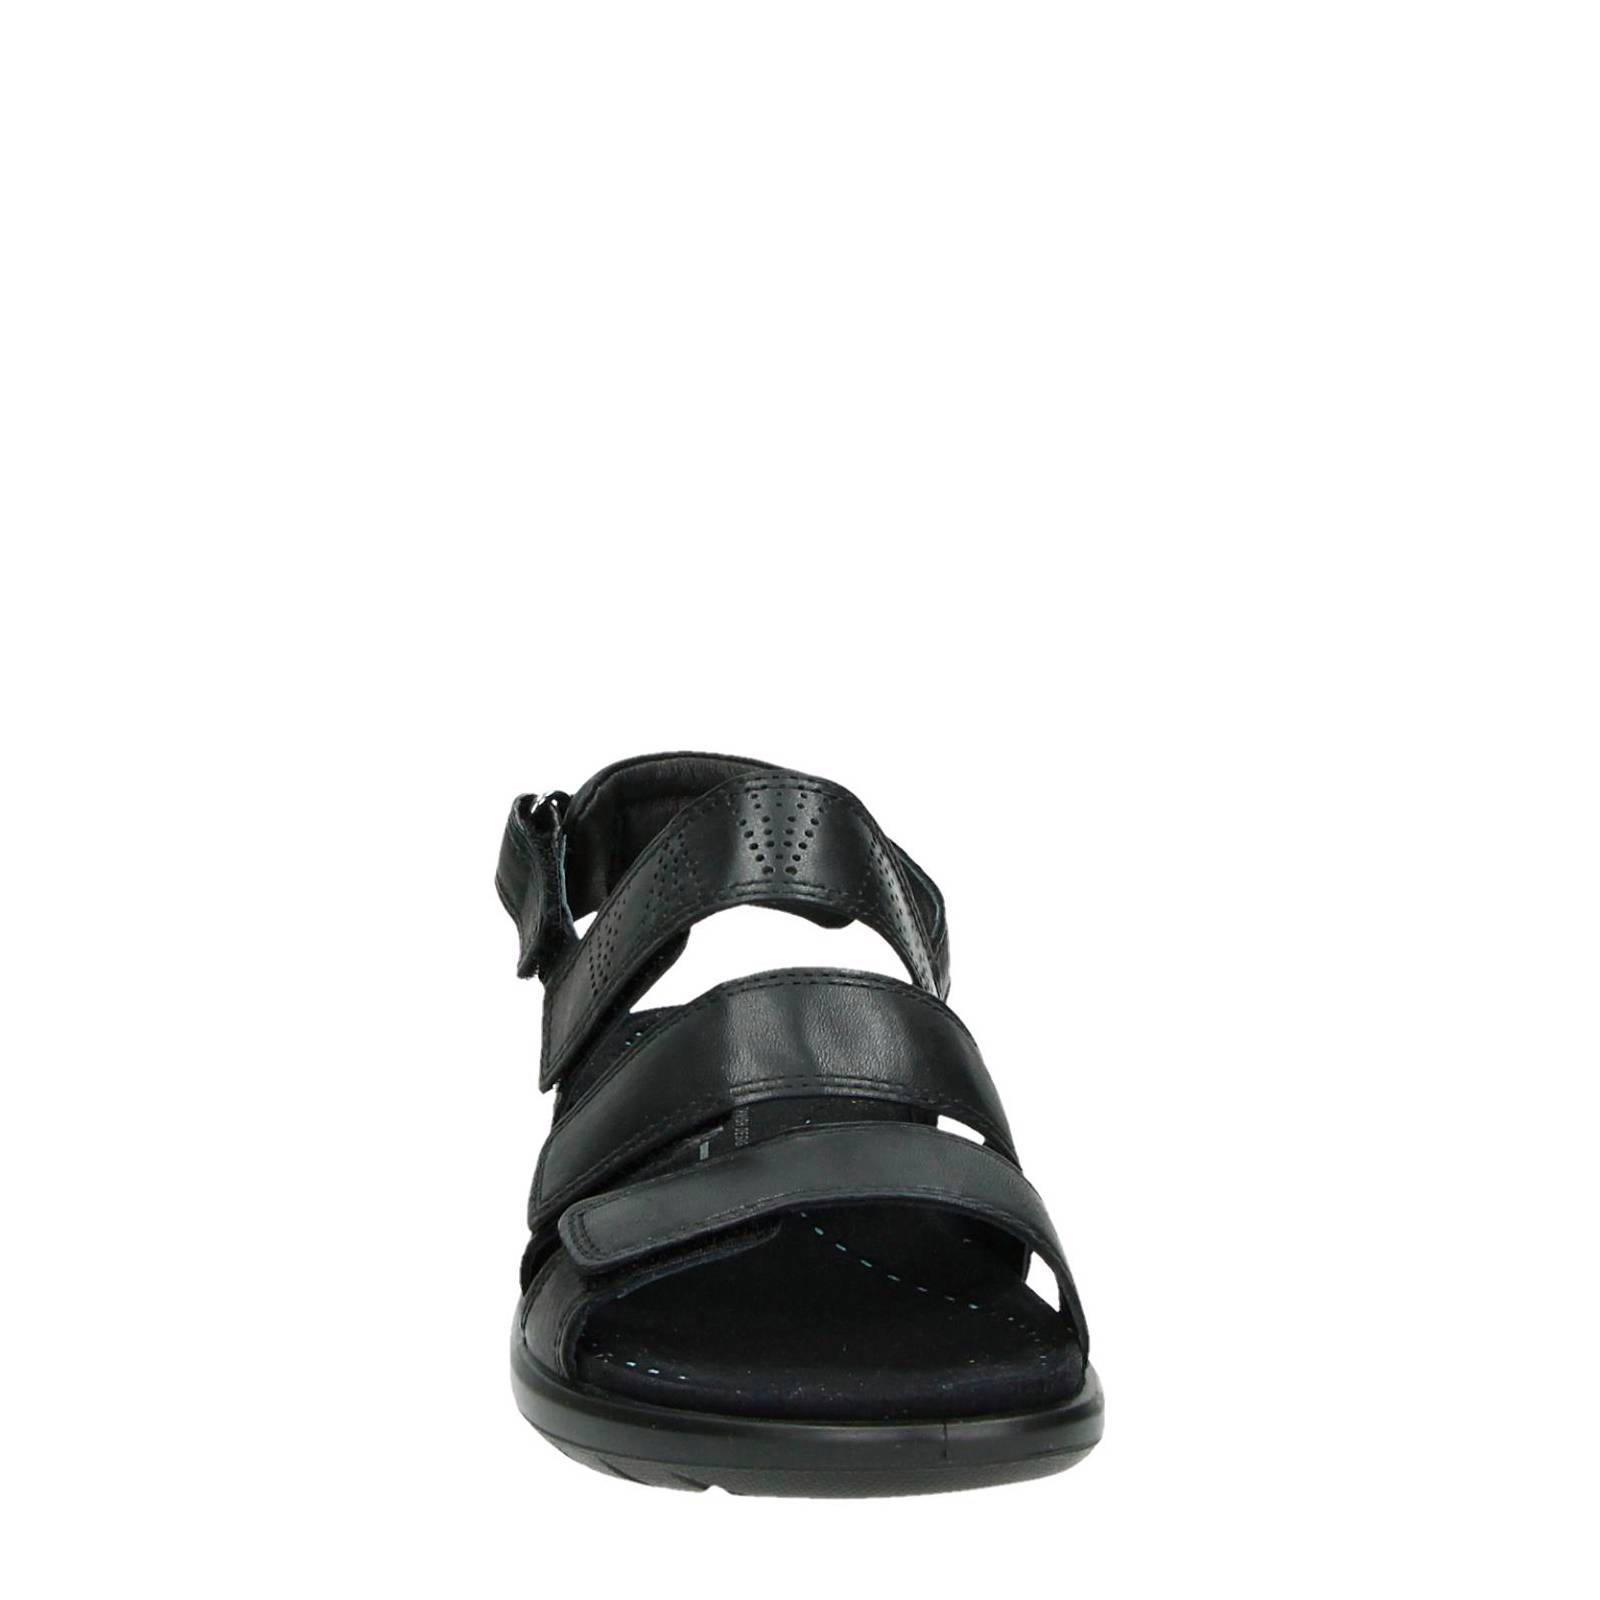 Ecco Soft 5 leren sandalen | wehkamp